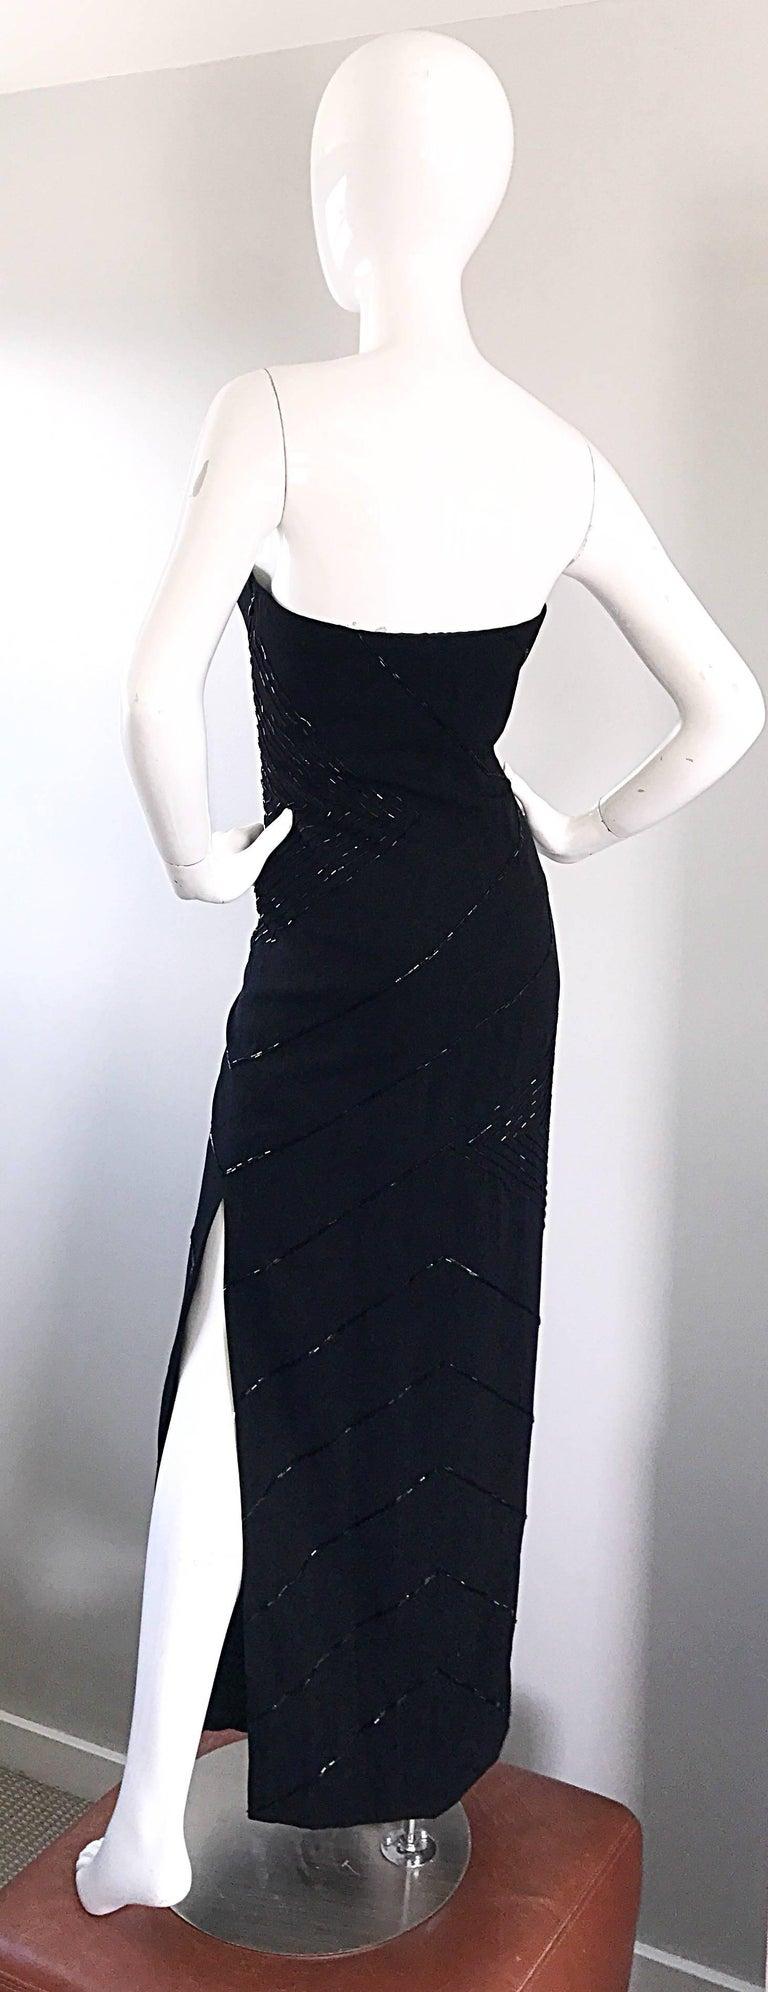 Women's Vintage BIll Blass Black 1990s Beaded Size 8 90s Strapless Evening Dress For Sale